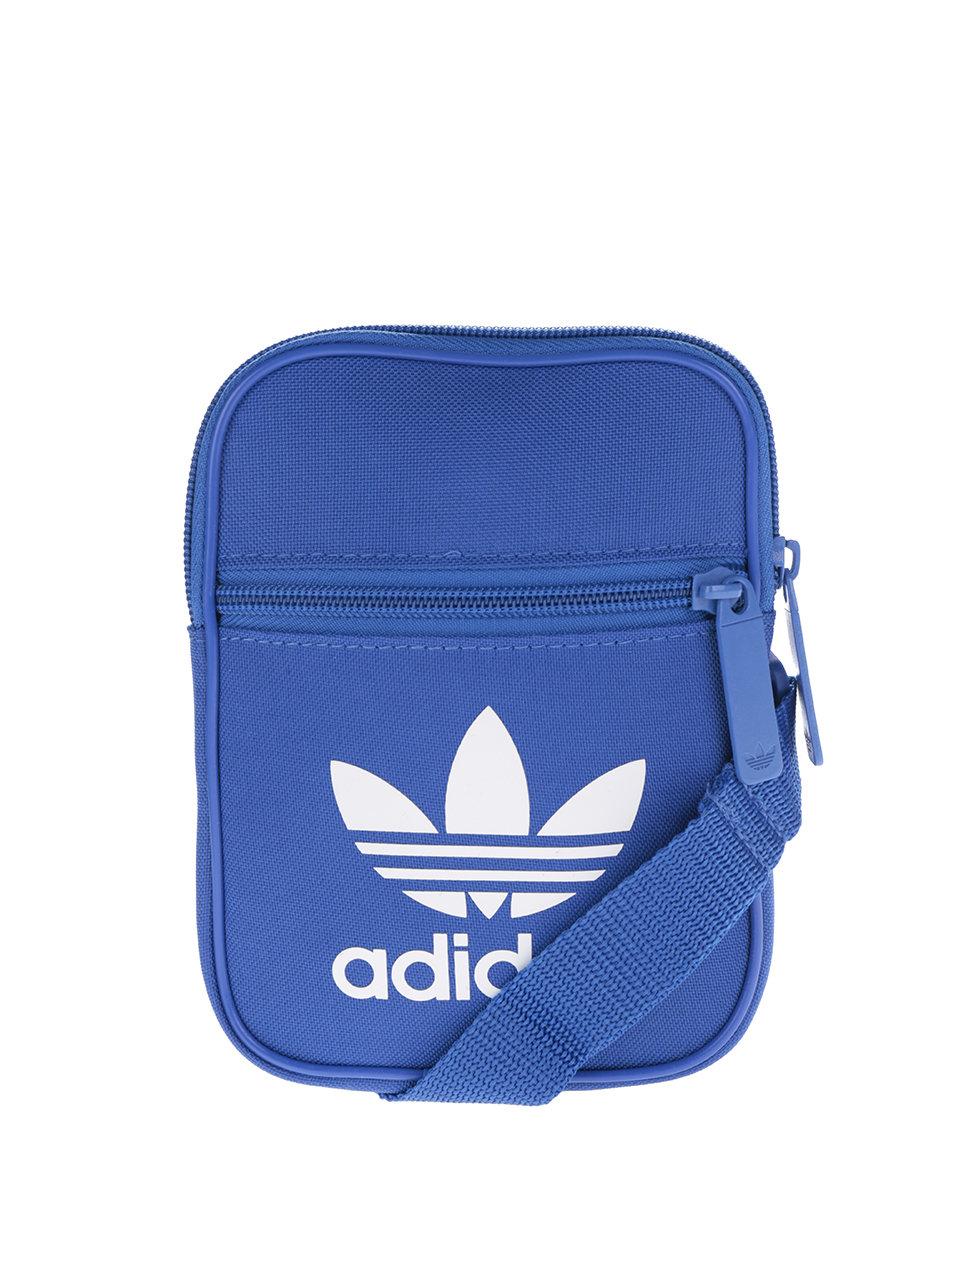 Modrá malá unisex crossbody taška adidas Originals ... f5f2125aac1